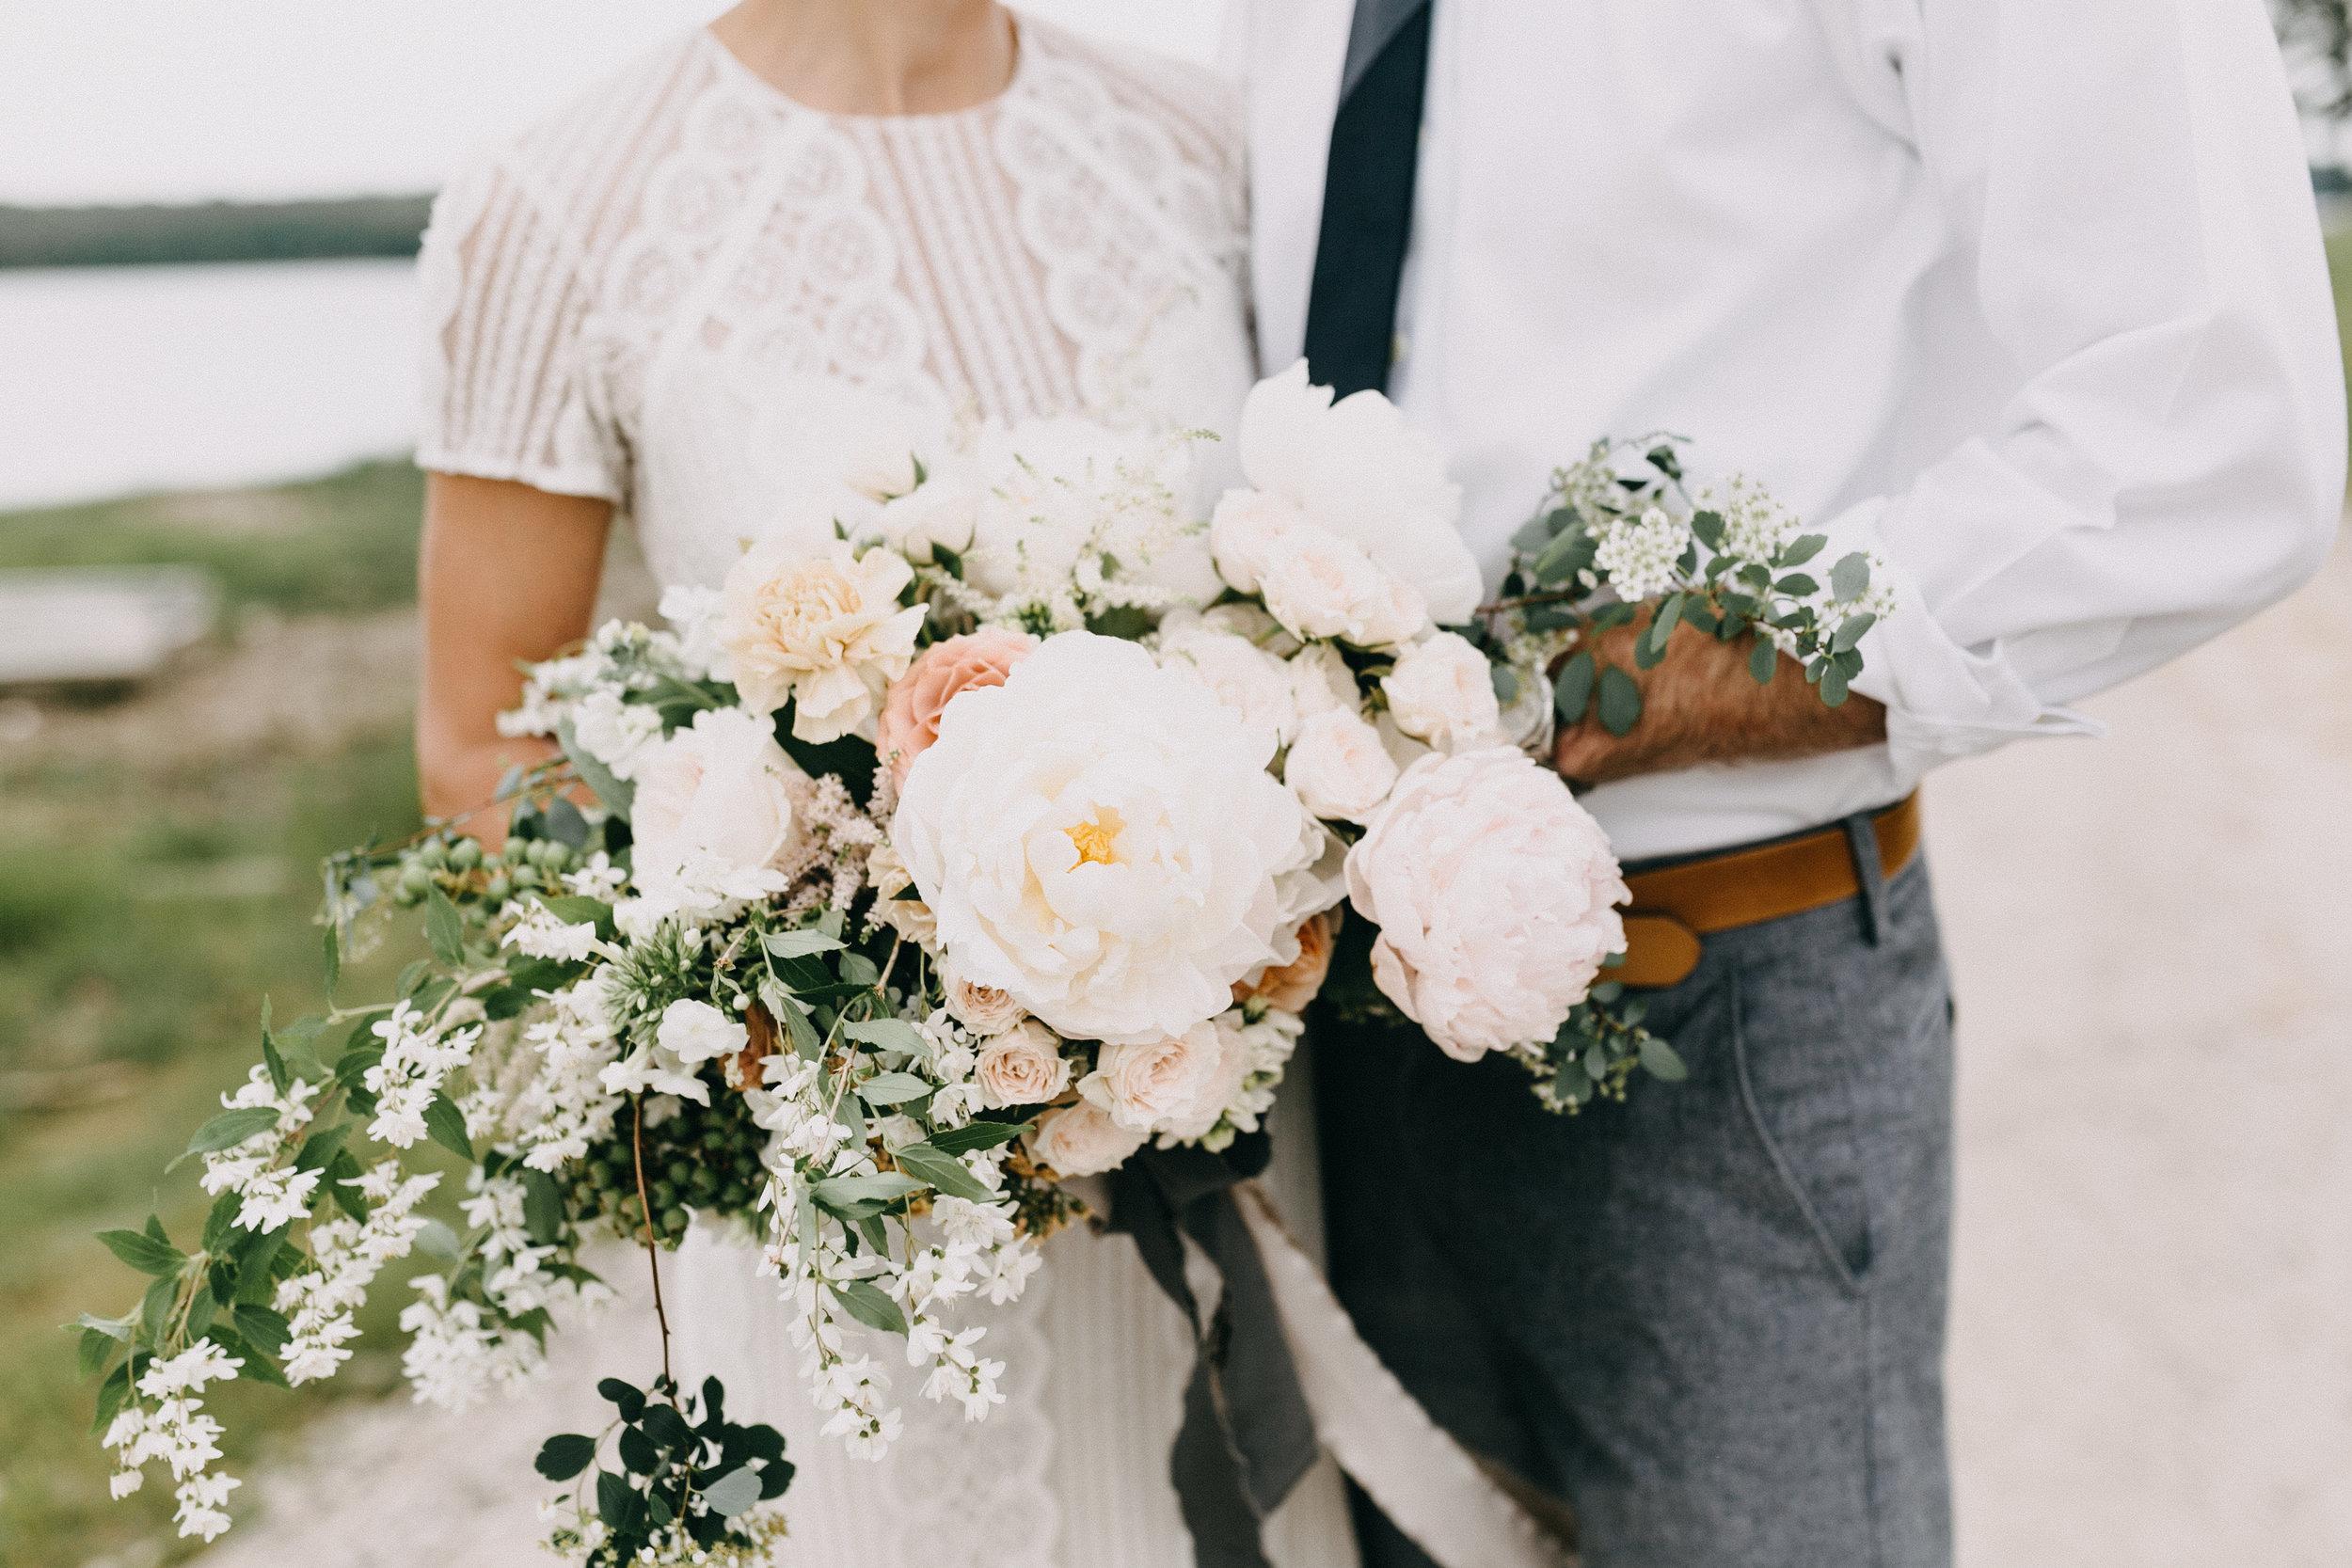 Watershed-Floral-Maine-Maritime-Wedding-Bridal-Bouquet-Centerpieces-0142.jpg